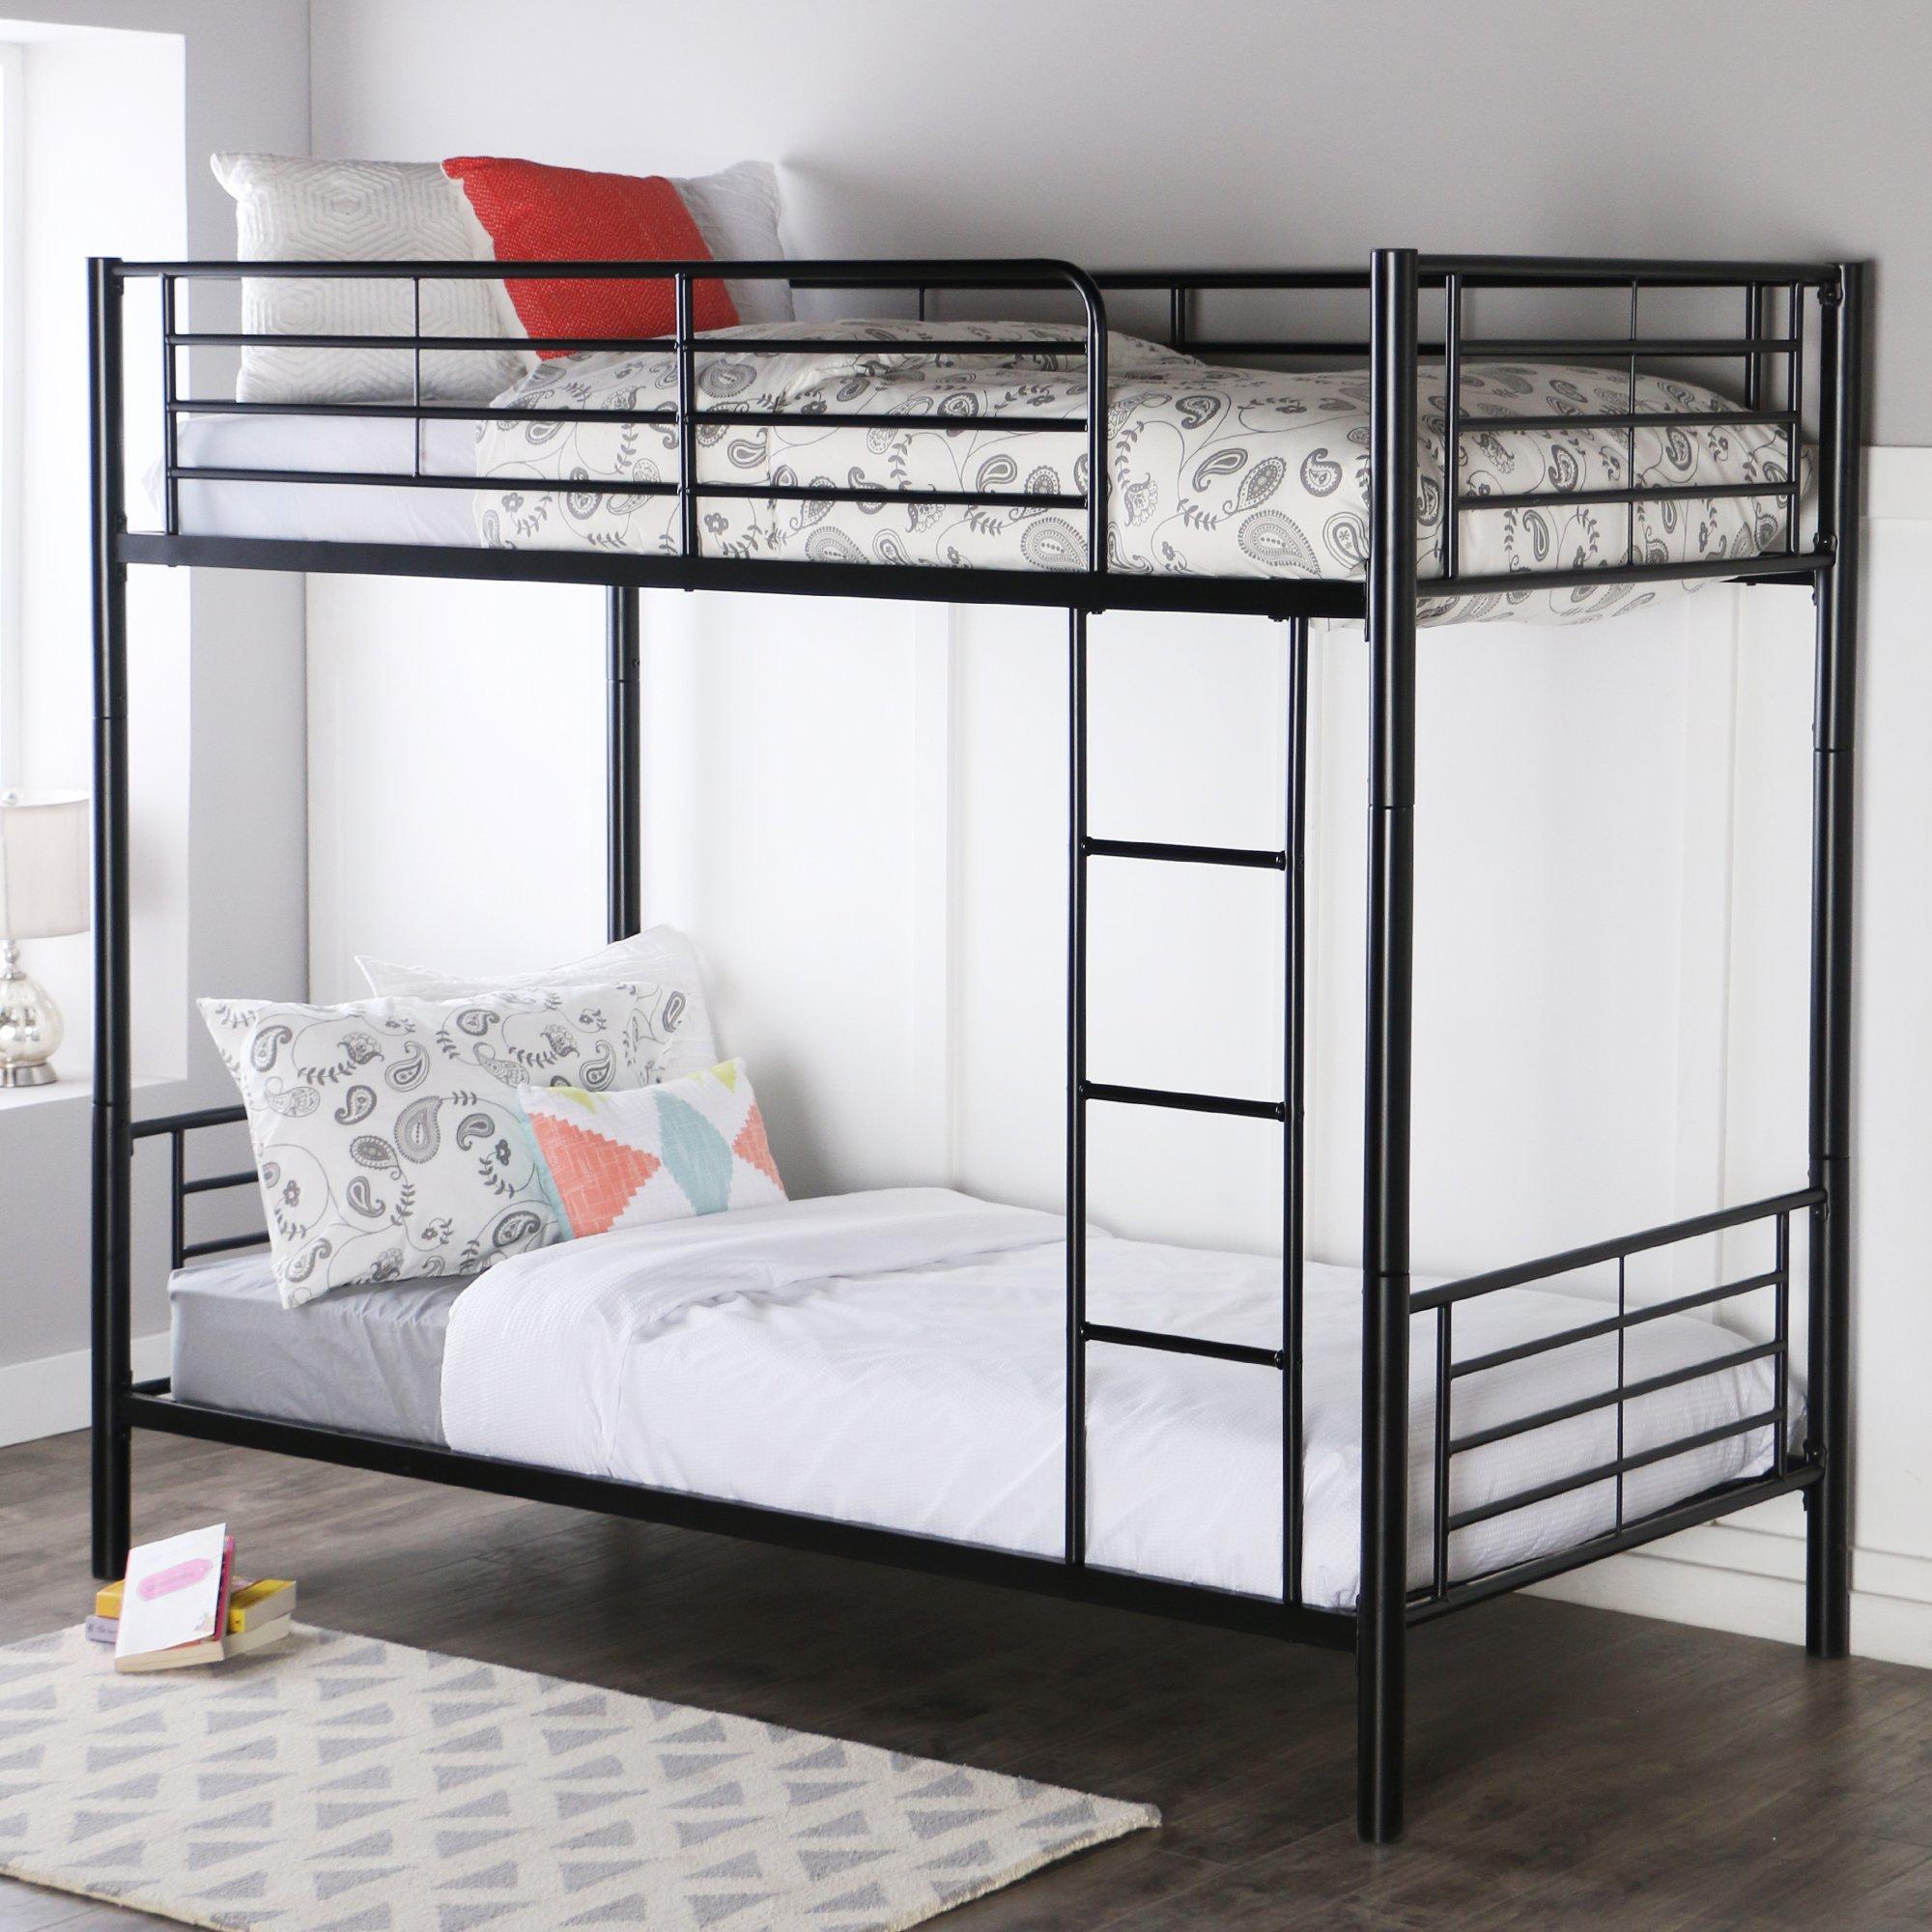 Walker Edison Twin-Over-Twin Metal Bunk Bed, Black by Walker Edison Furniture Company